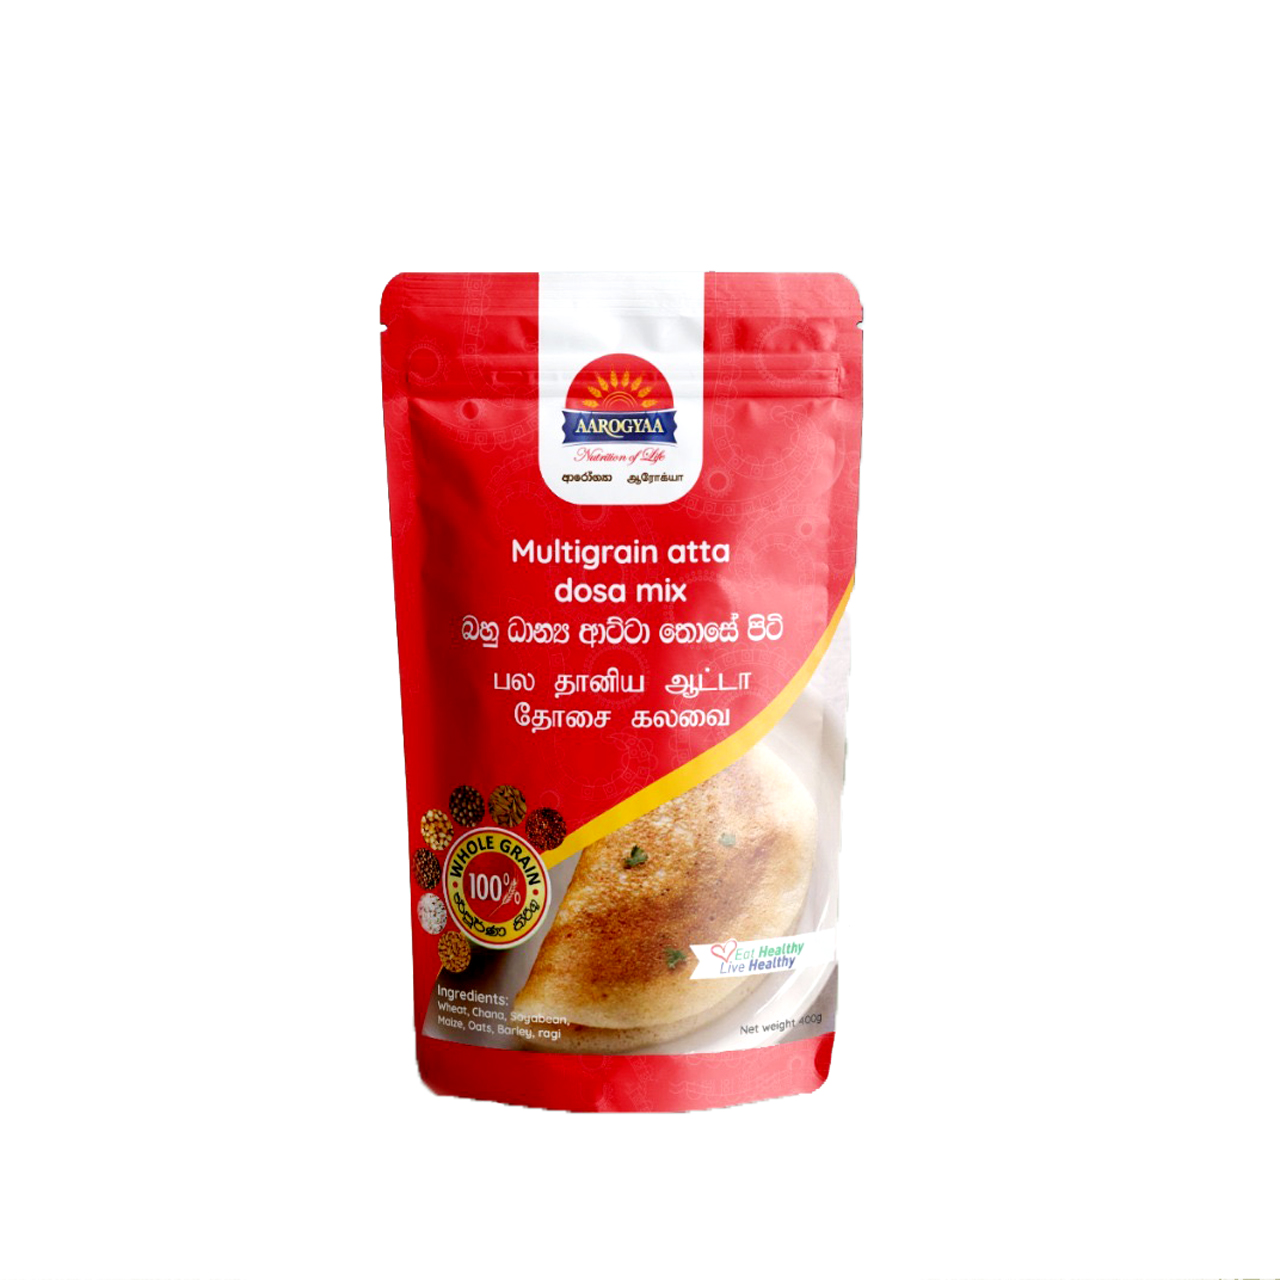 Aarogyaa Atta Dosa Mix Flour 400g - in Sri Lanka